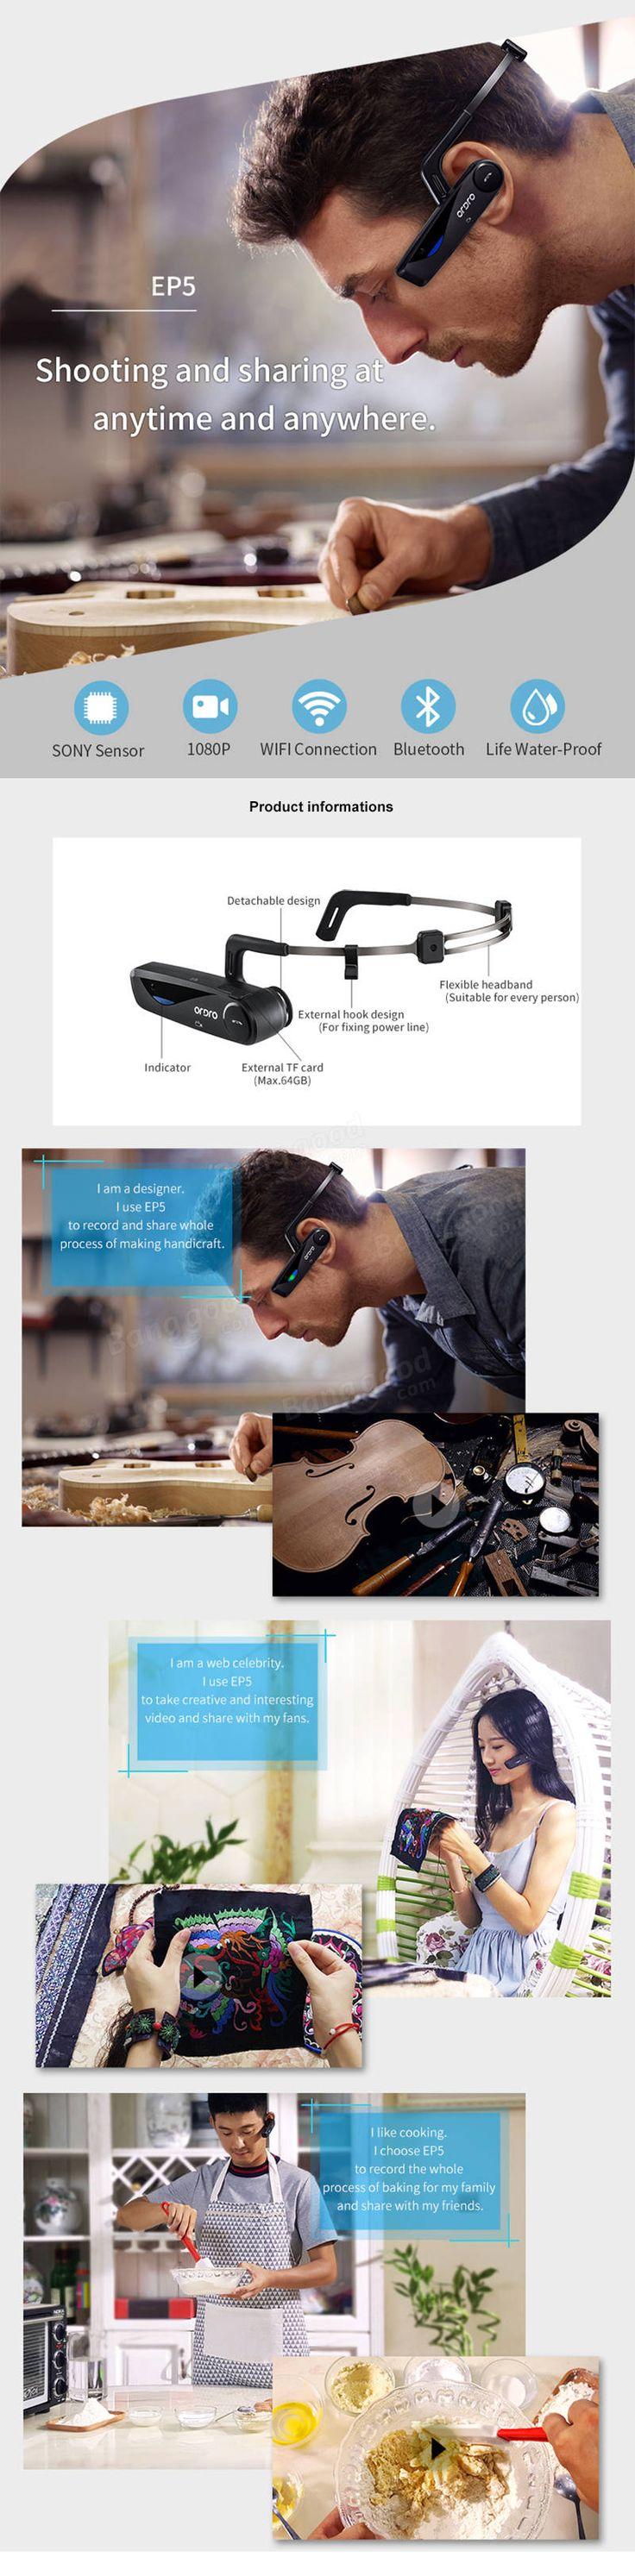 XANES EP5 Headset Driving Bluetooth Headset  Wireless Handsfree Headset Wifi HD Camera Mini Camera